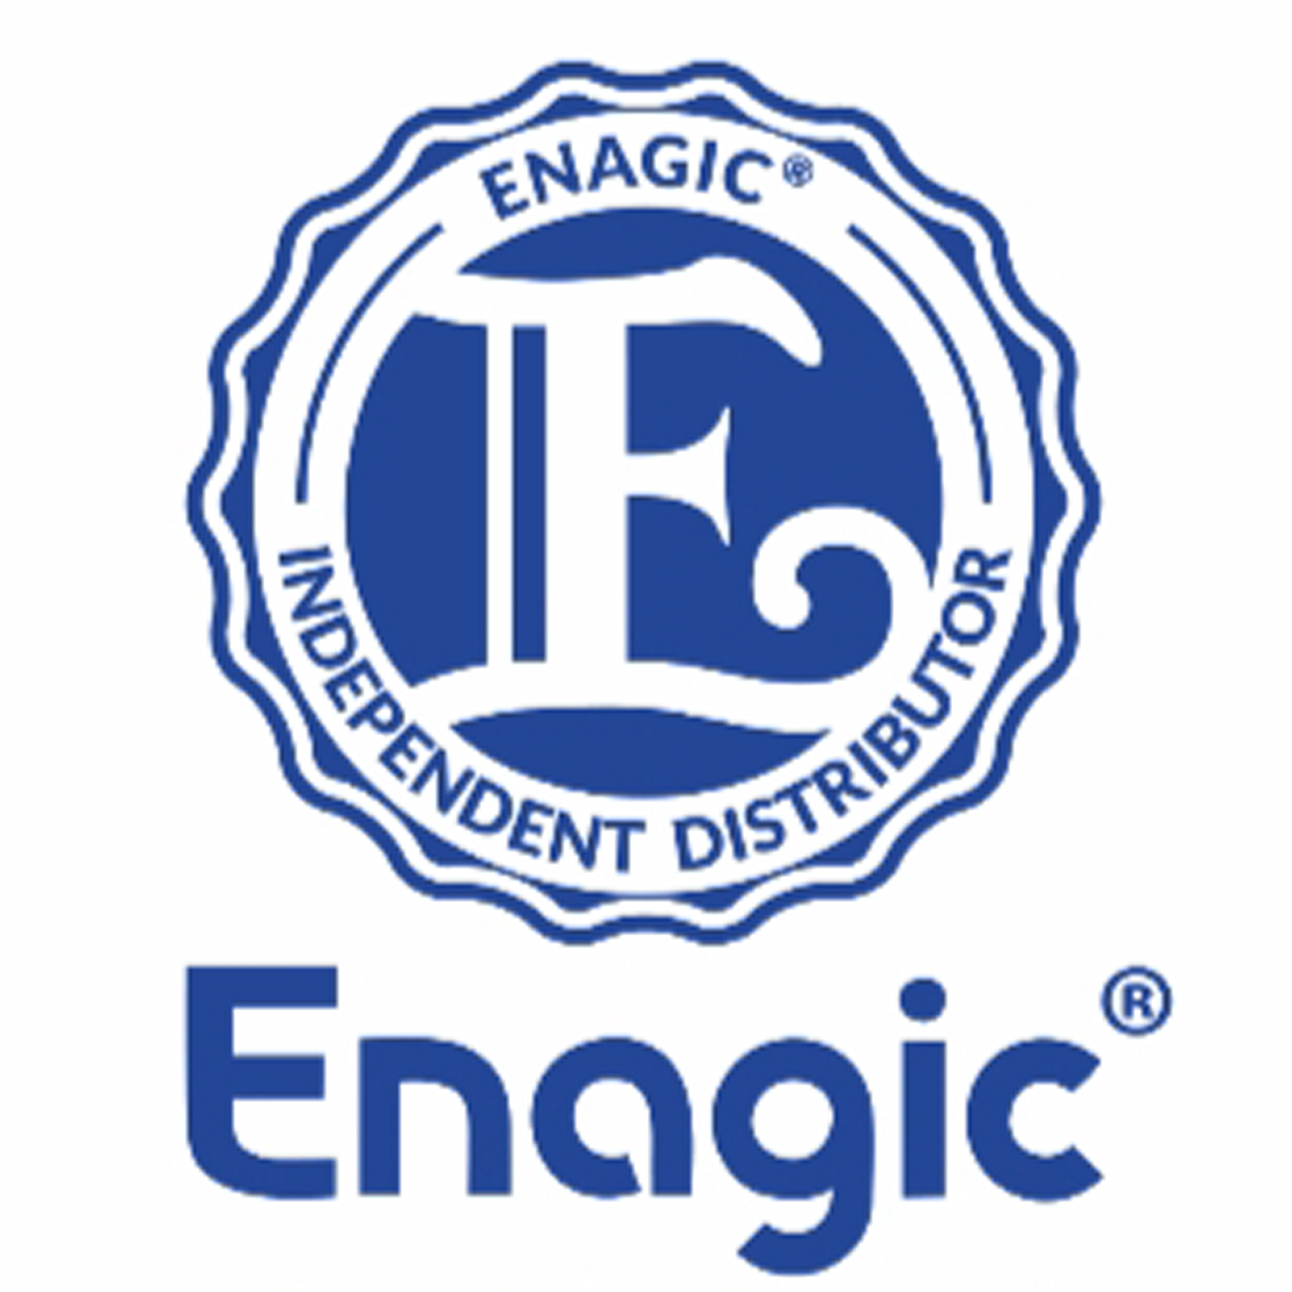 Enagic®